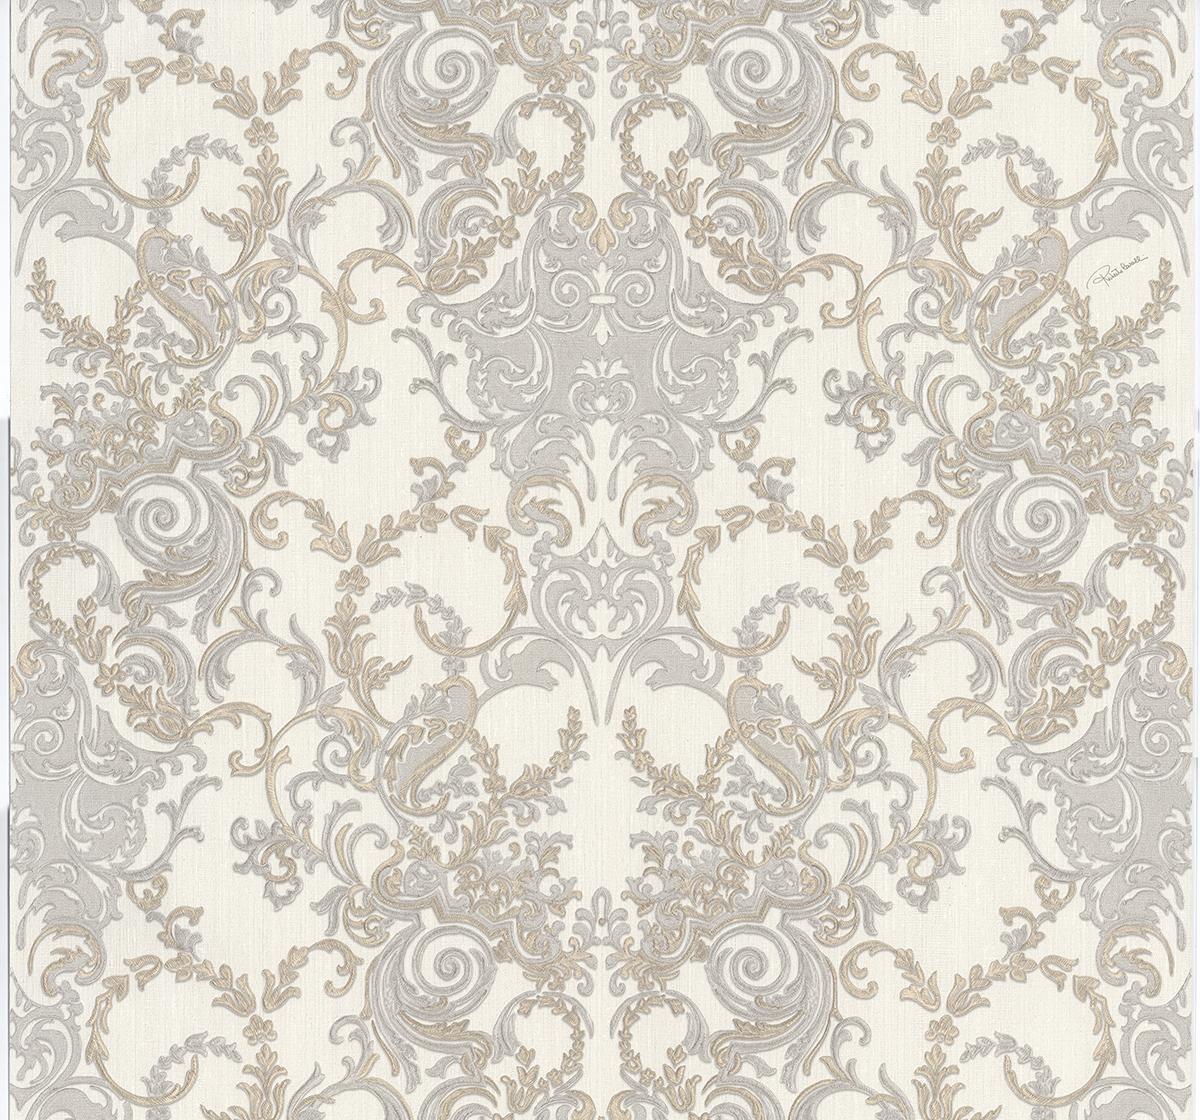 Roberto Cavalli Barocco RC15066 Wallpaper GreySilverGold 1200x1120